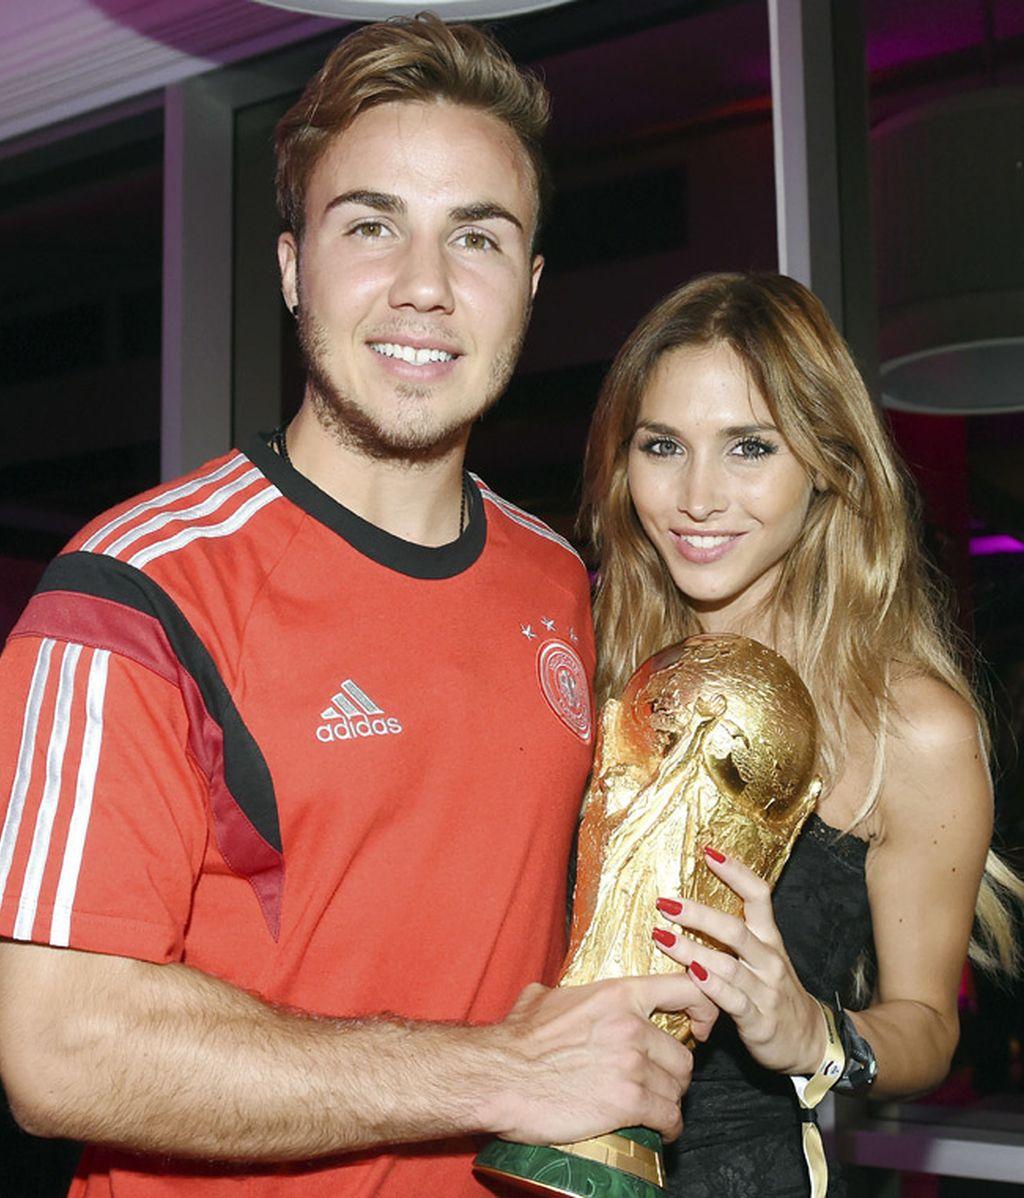 El goleador Götze junto a su novia Ann-Kathrin Broemmel